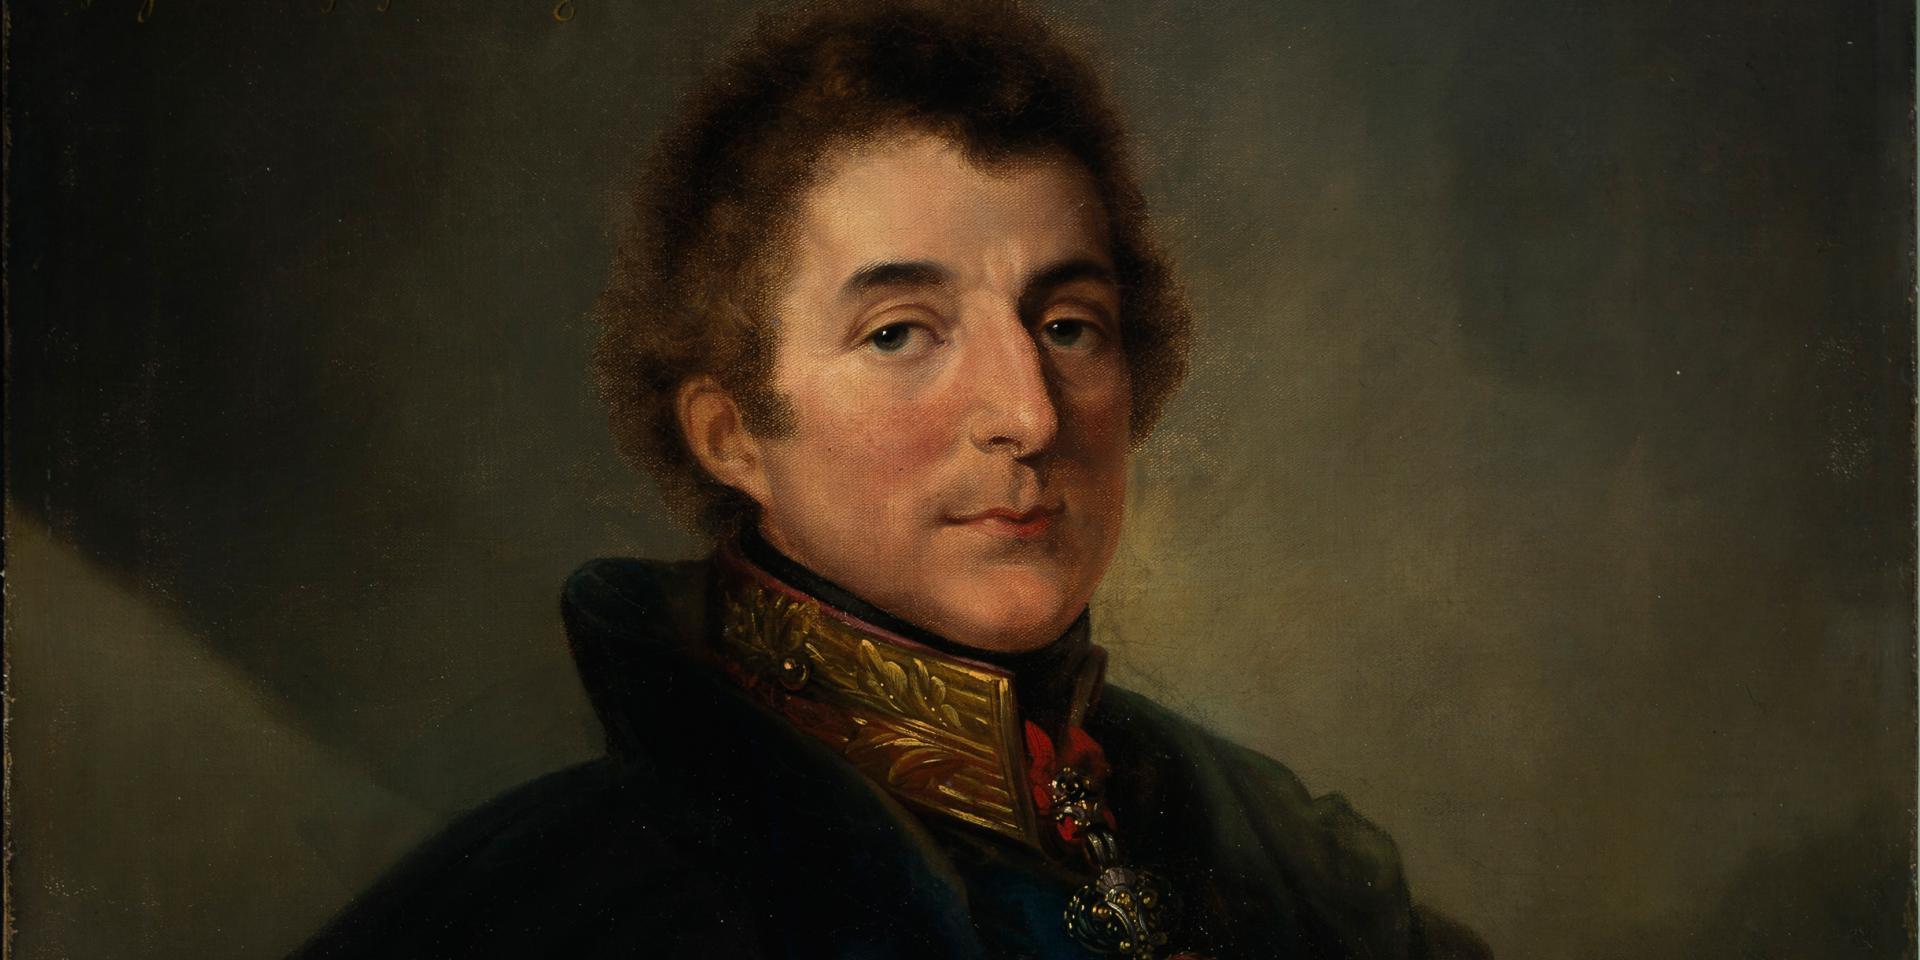 Field Marshal Arthur Wellesley, 1st Duke of Wellington by Peter Edward Stroehling, 1820